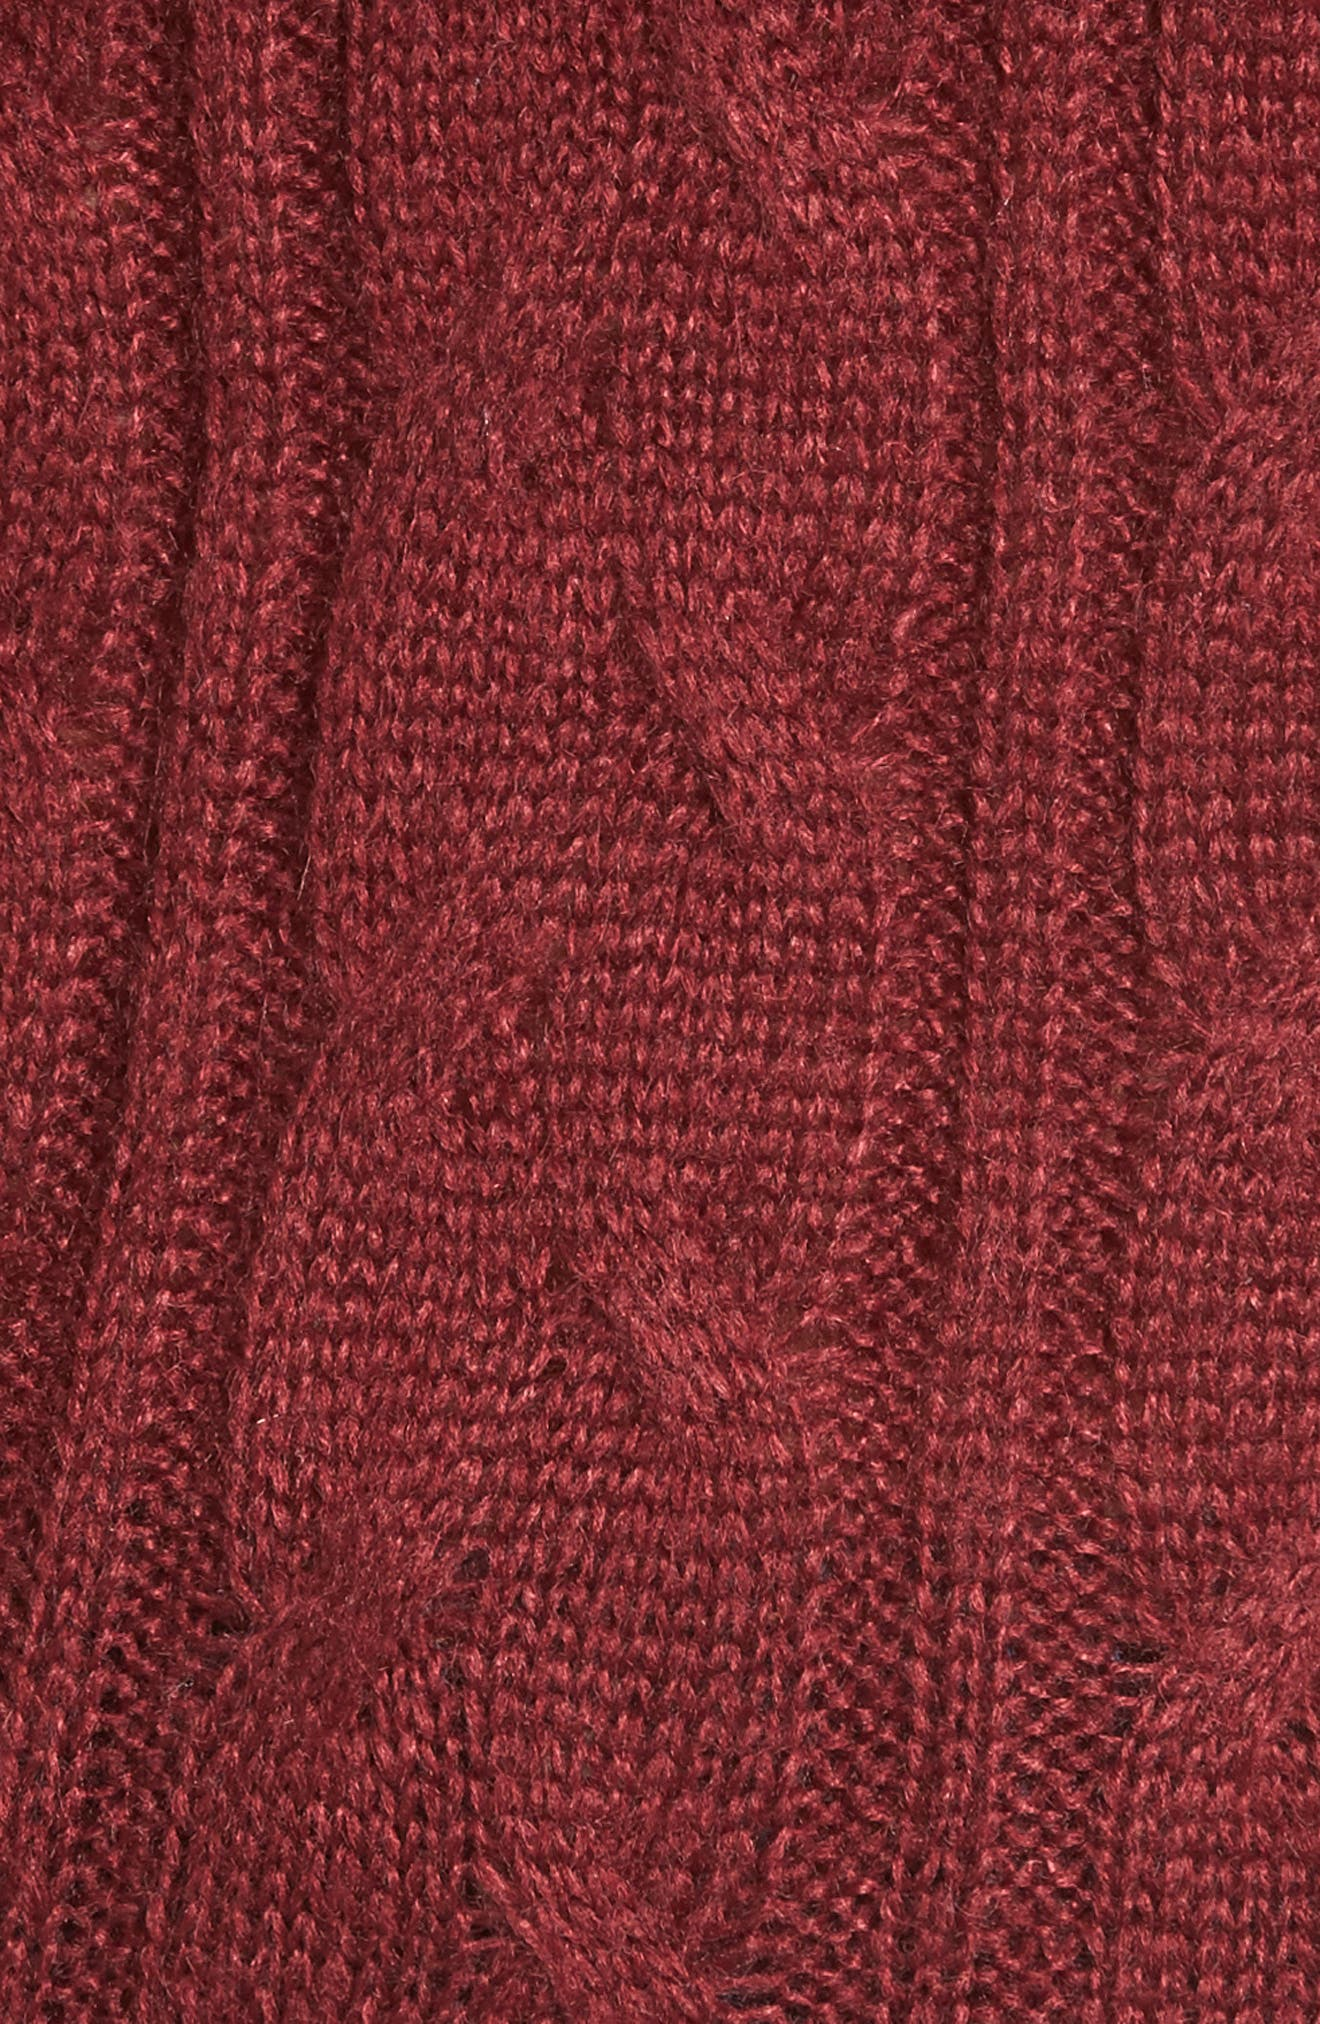 Sheldon Off the Shoulder Sweater,                             Alternate thumbnail 5, color,                             Red Tannin